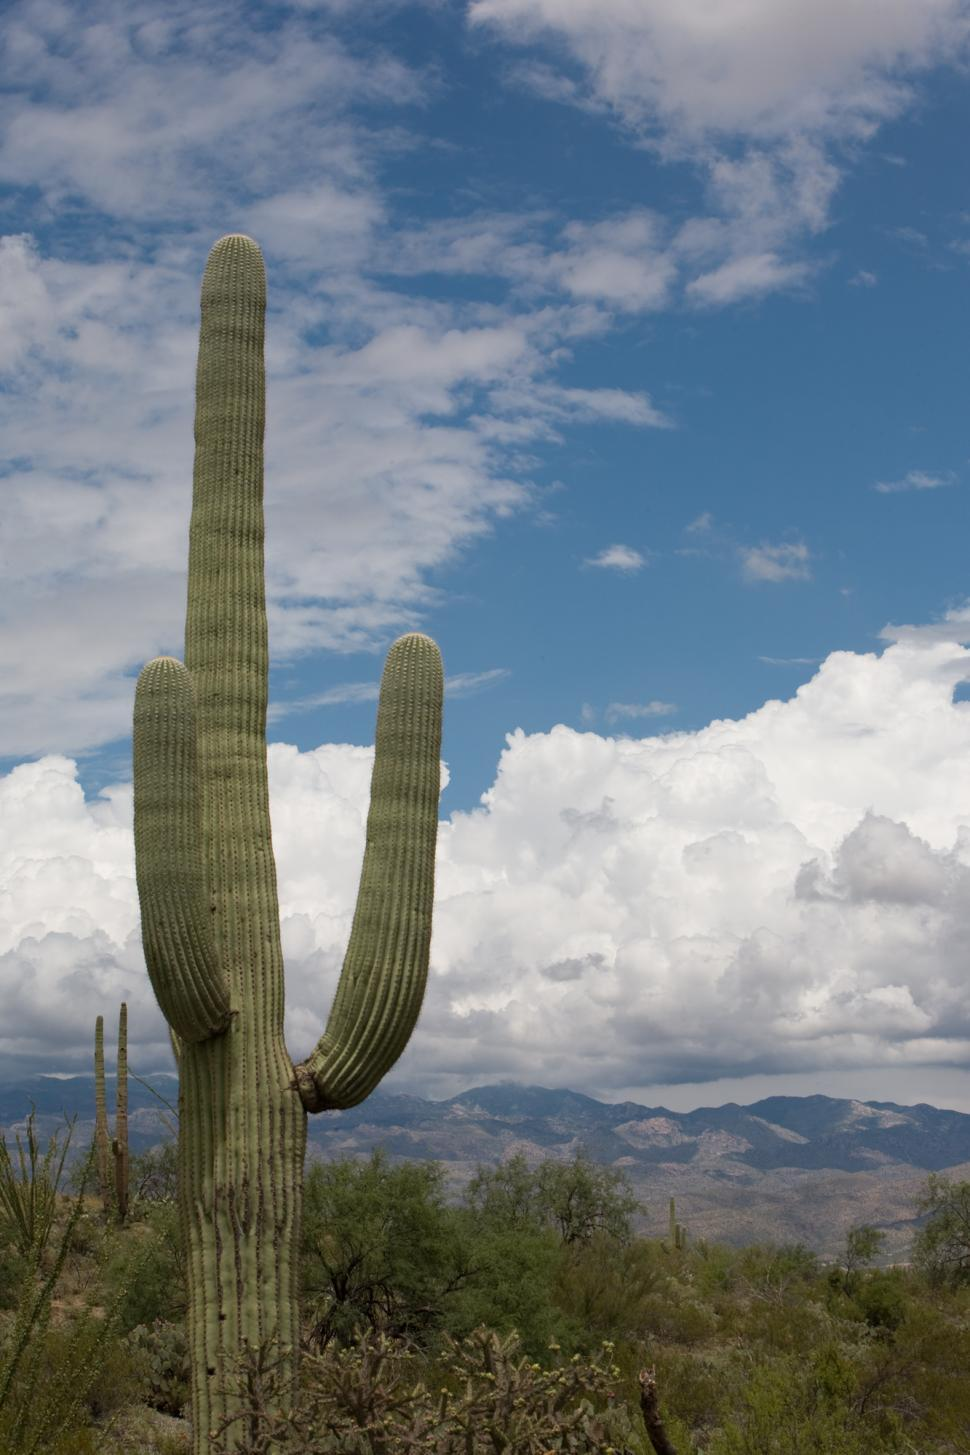 Download Free Stock Photo of Saguaro Cactus